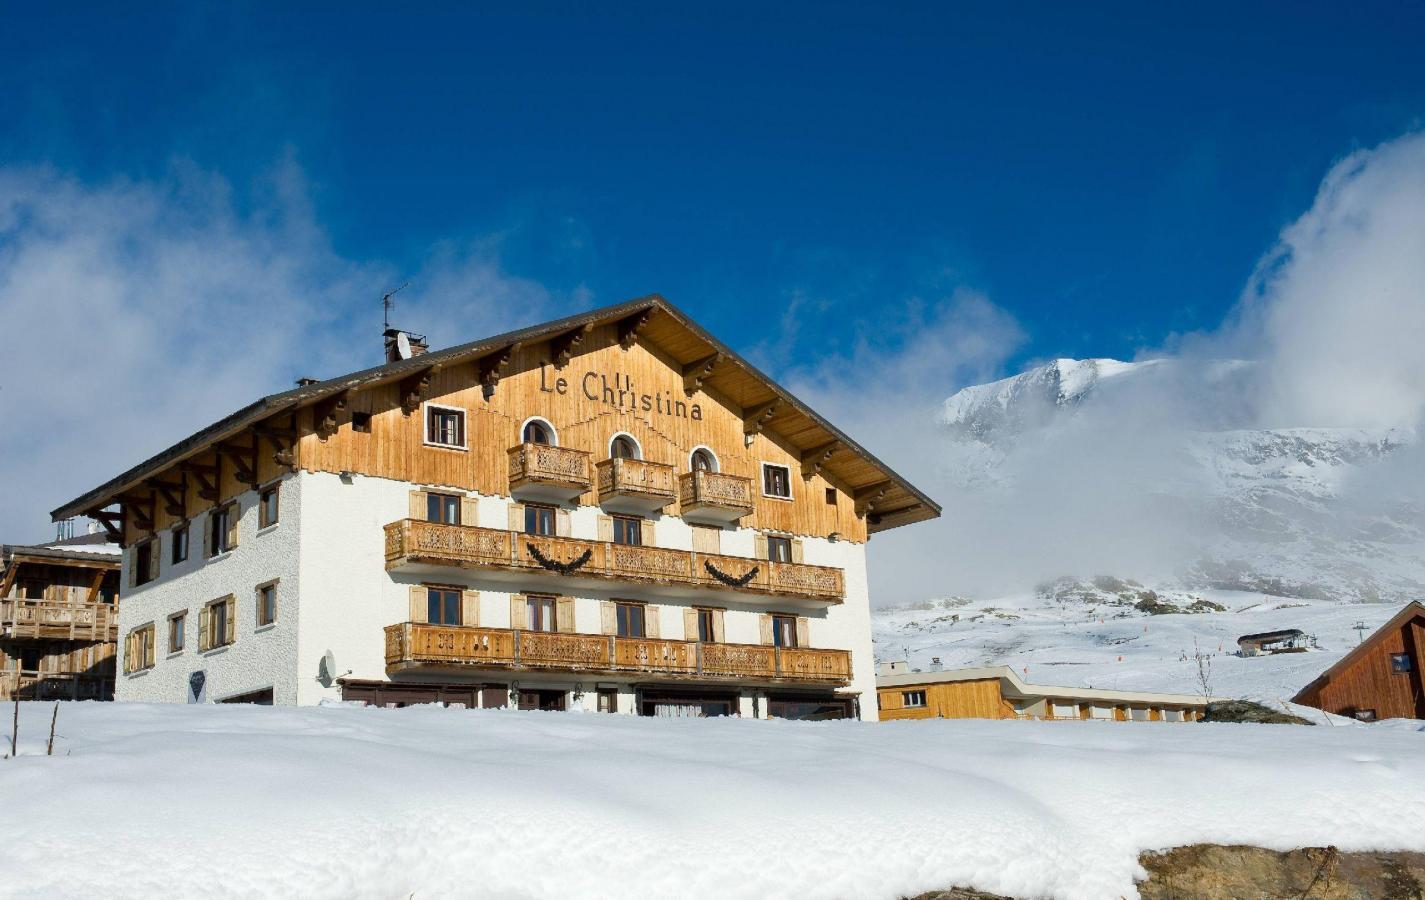 Hotel le christina 20 alpe d 39 huez location vacances for Hotel au ski